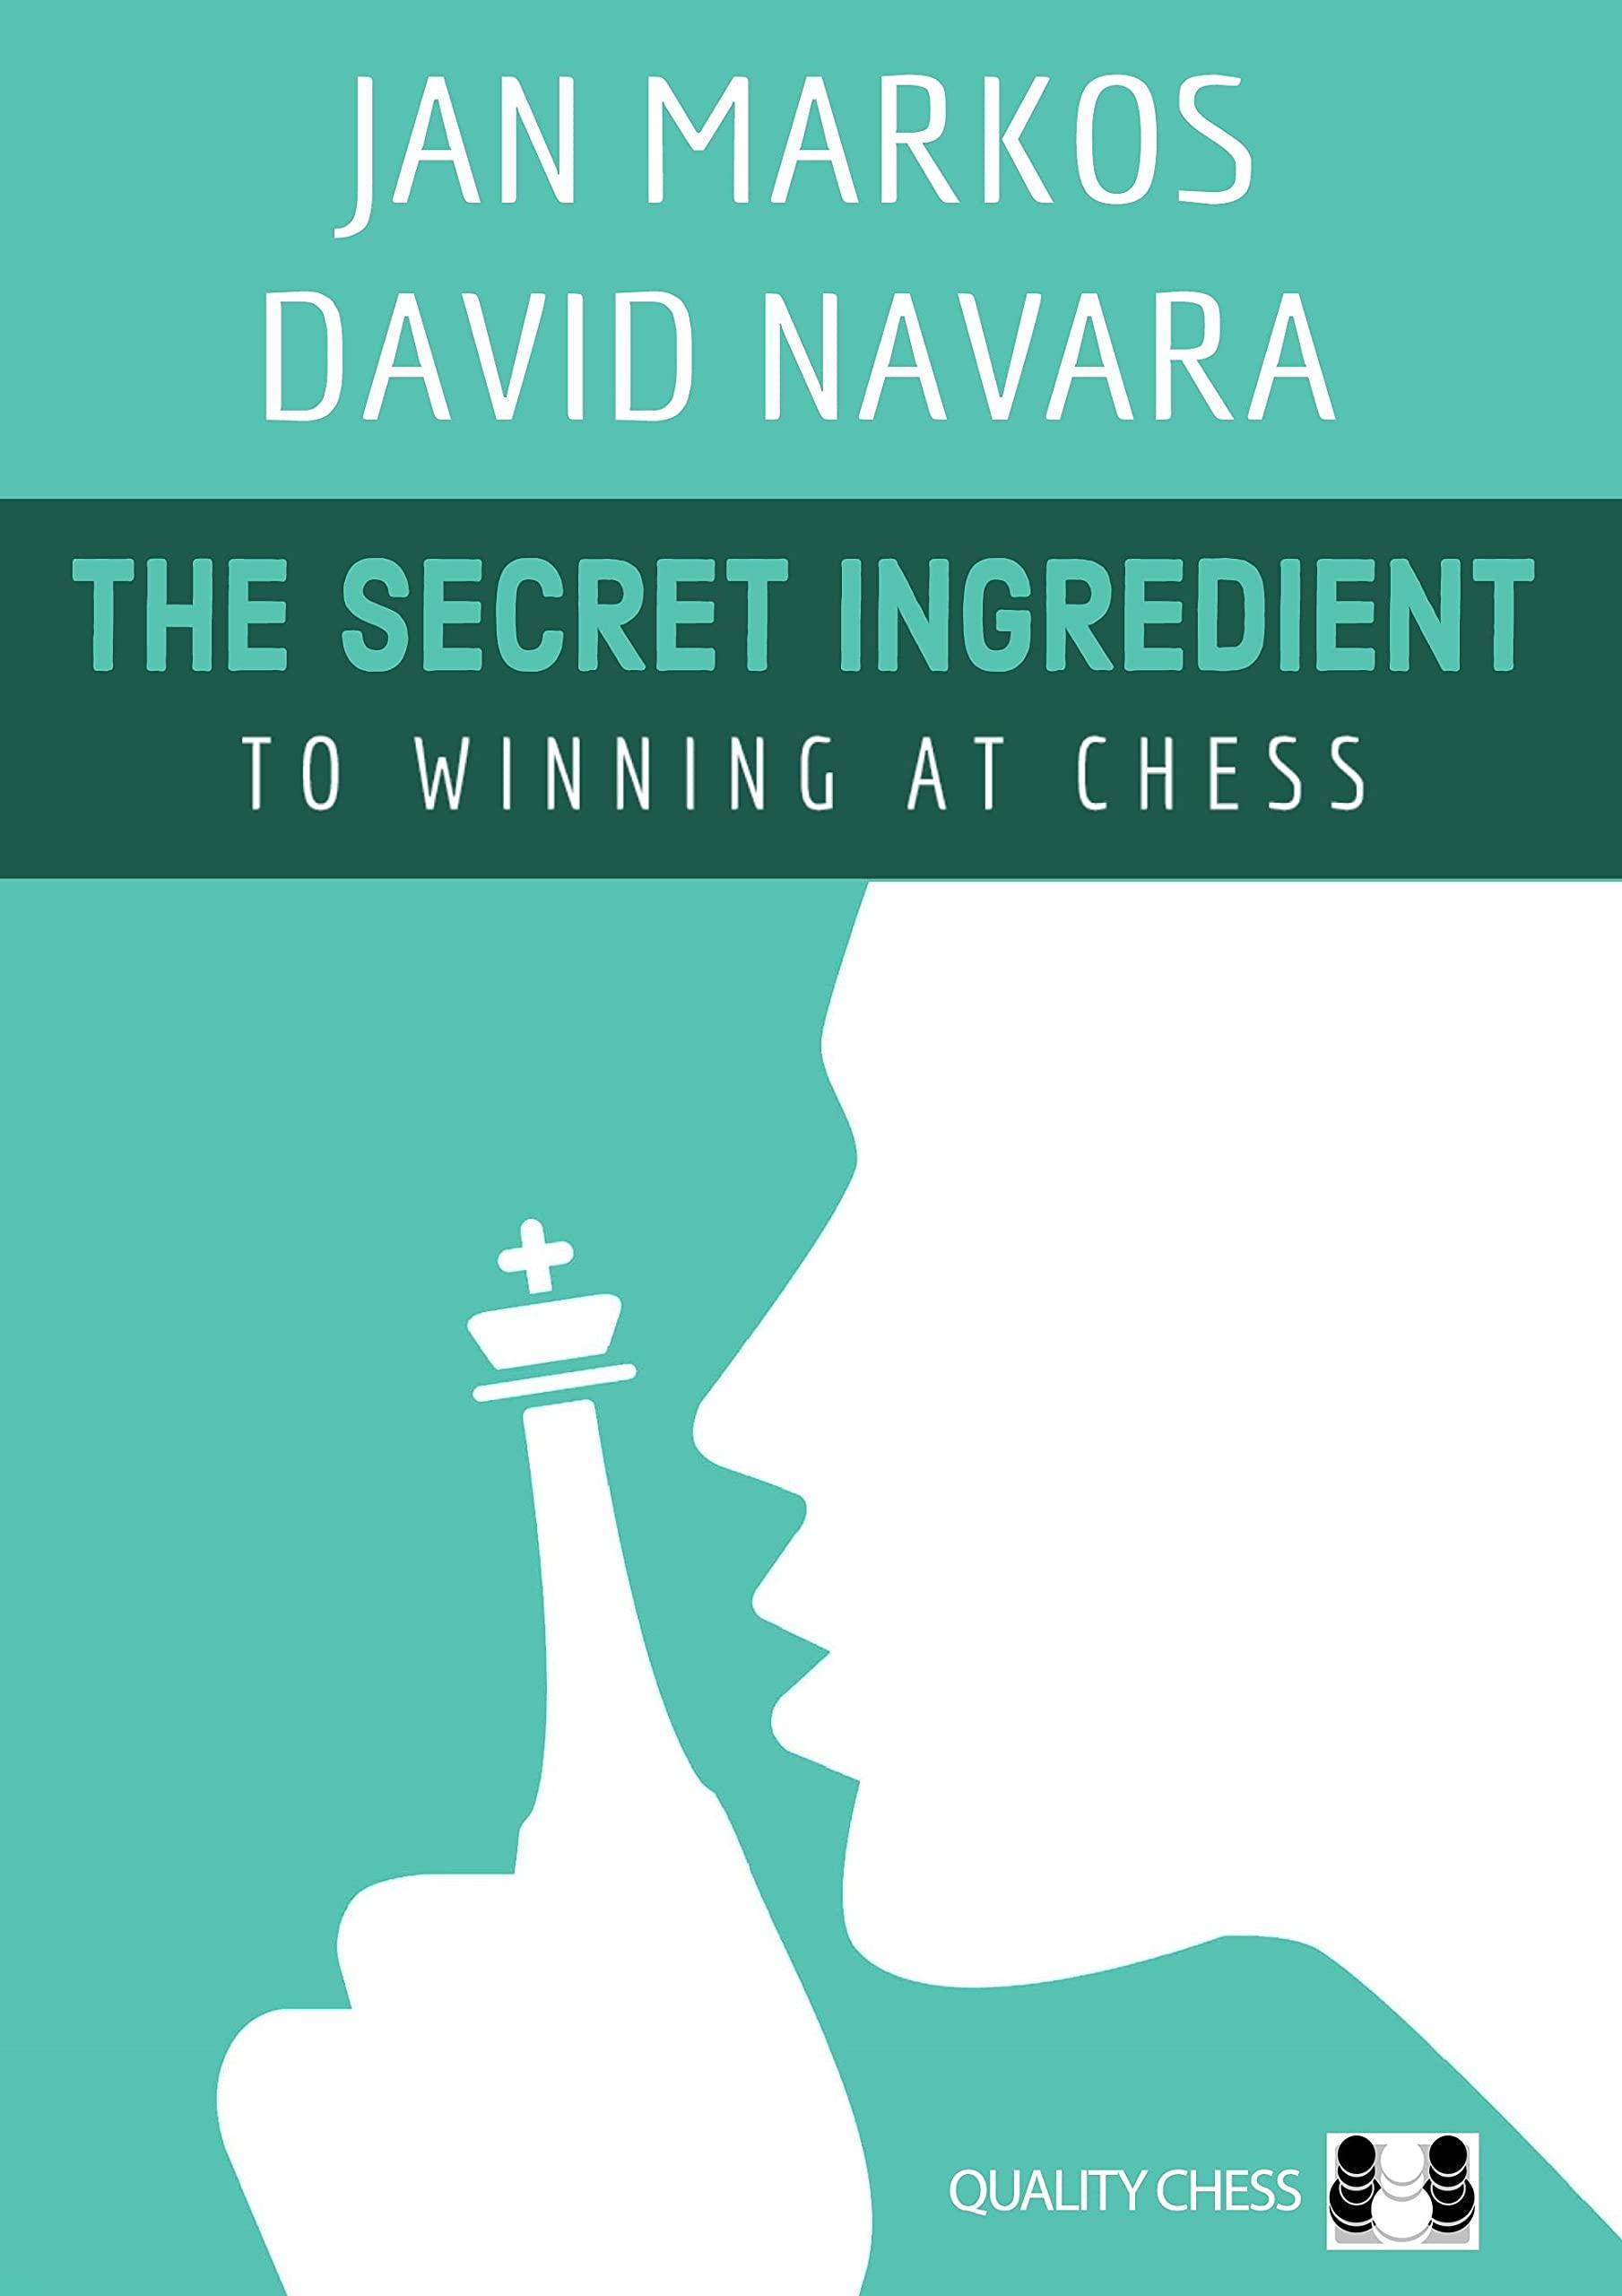 The Secret Ingredient: To Winning at Chess, Jan Markos & David Navara, Quality Chess, 7th Feb 2022, ISBN-13  :  978-1784831424